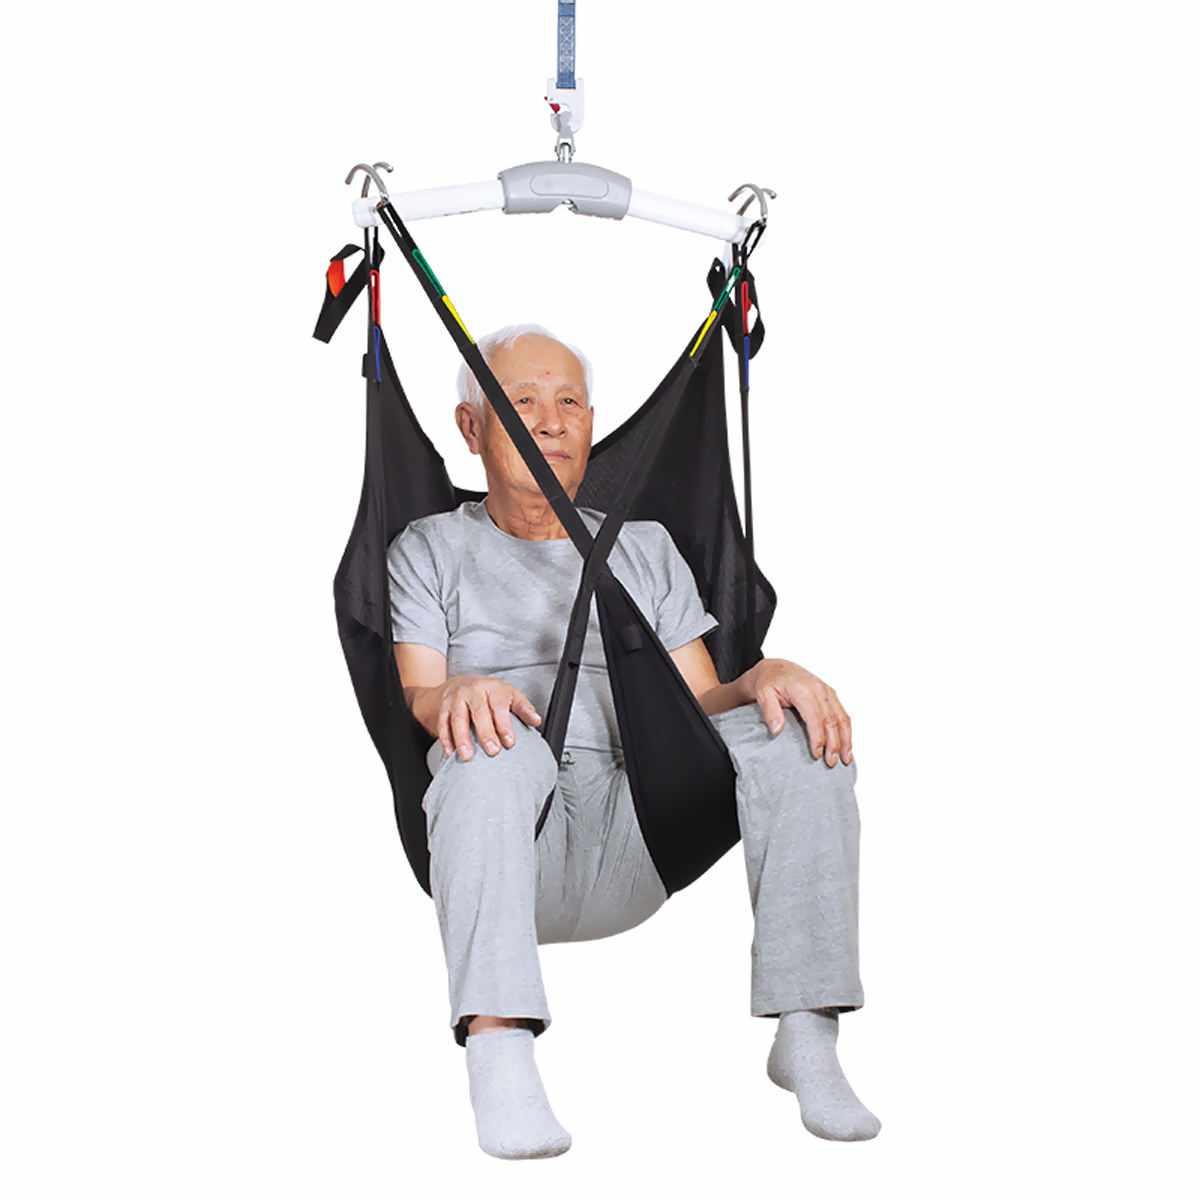 Prism Medical Universal Sling | Handicare Slings